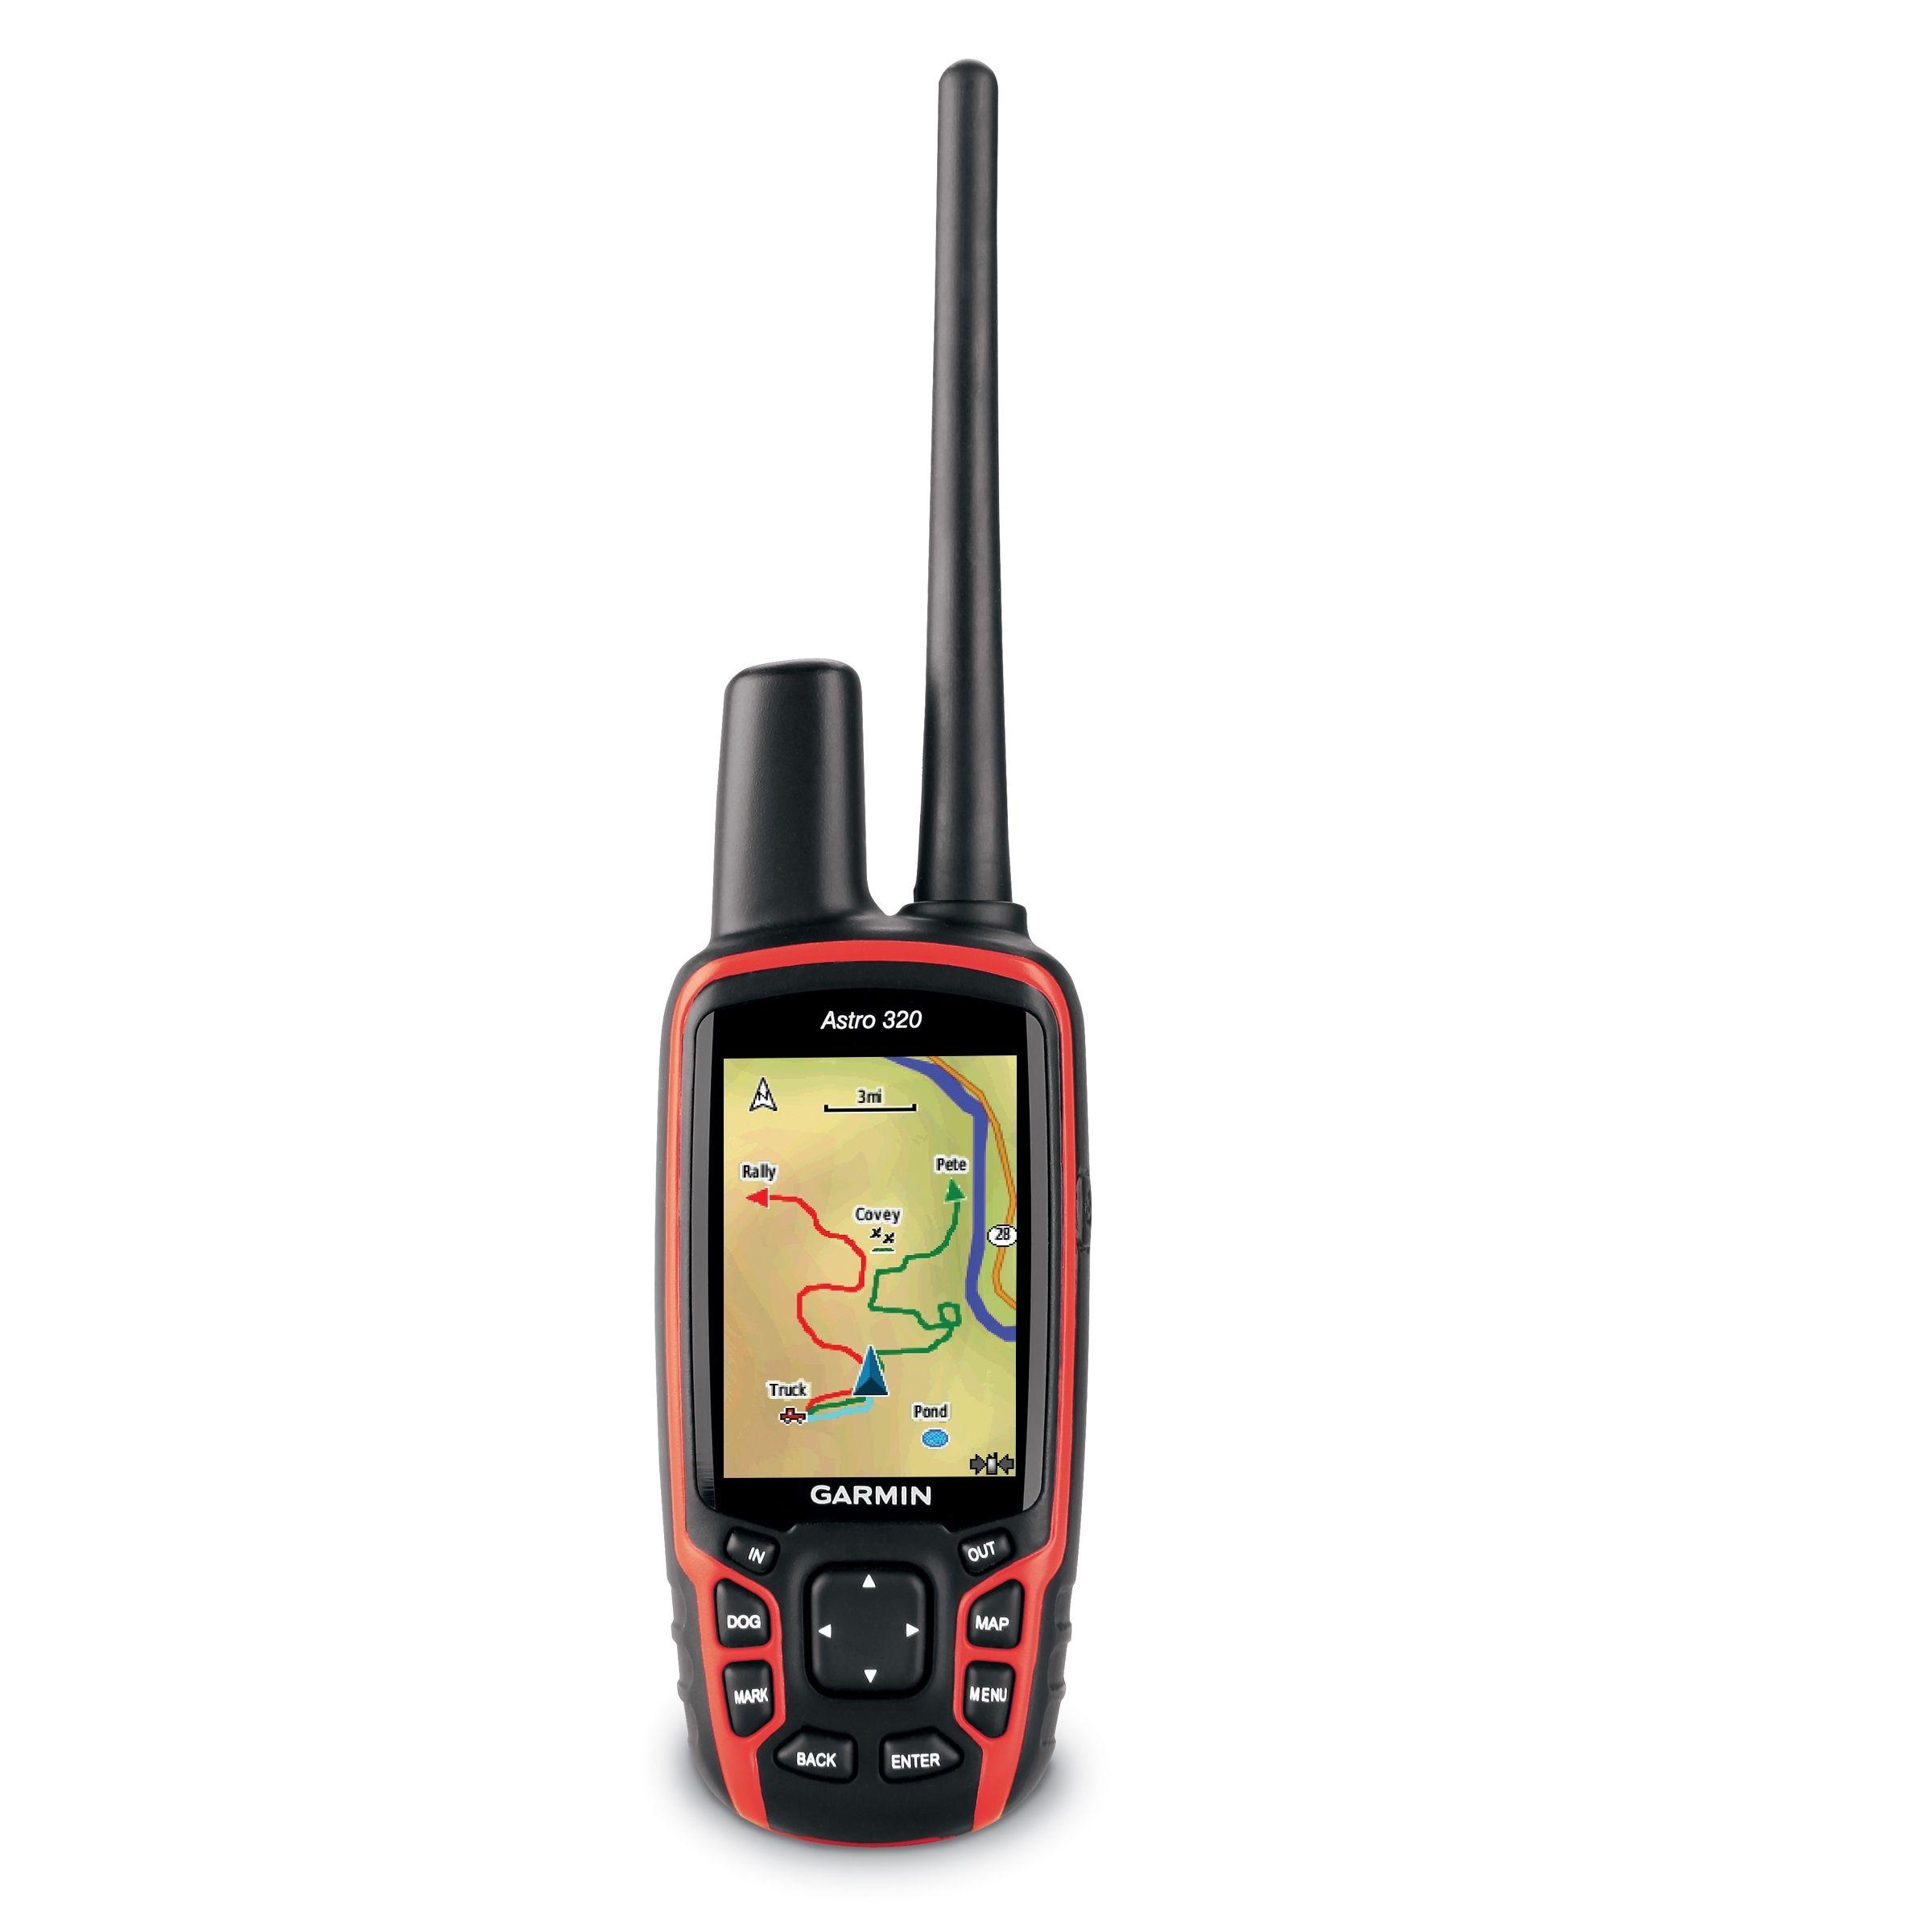 New Garmin Astro 320 Handheld GPS Dog Hunting Tracker